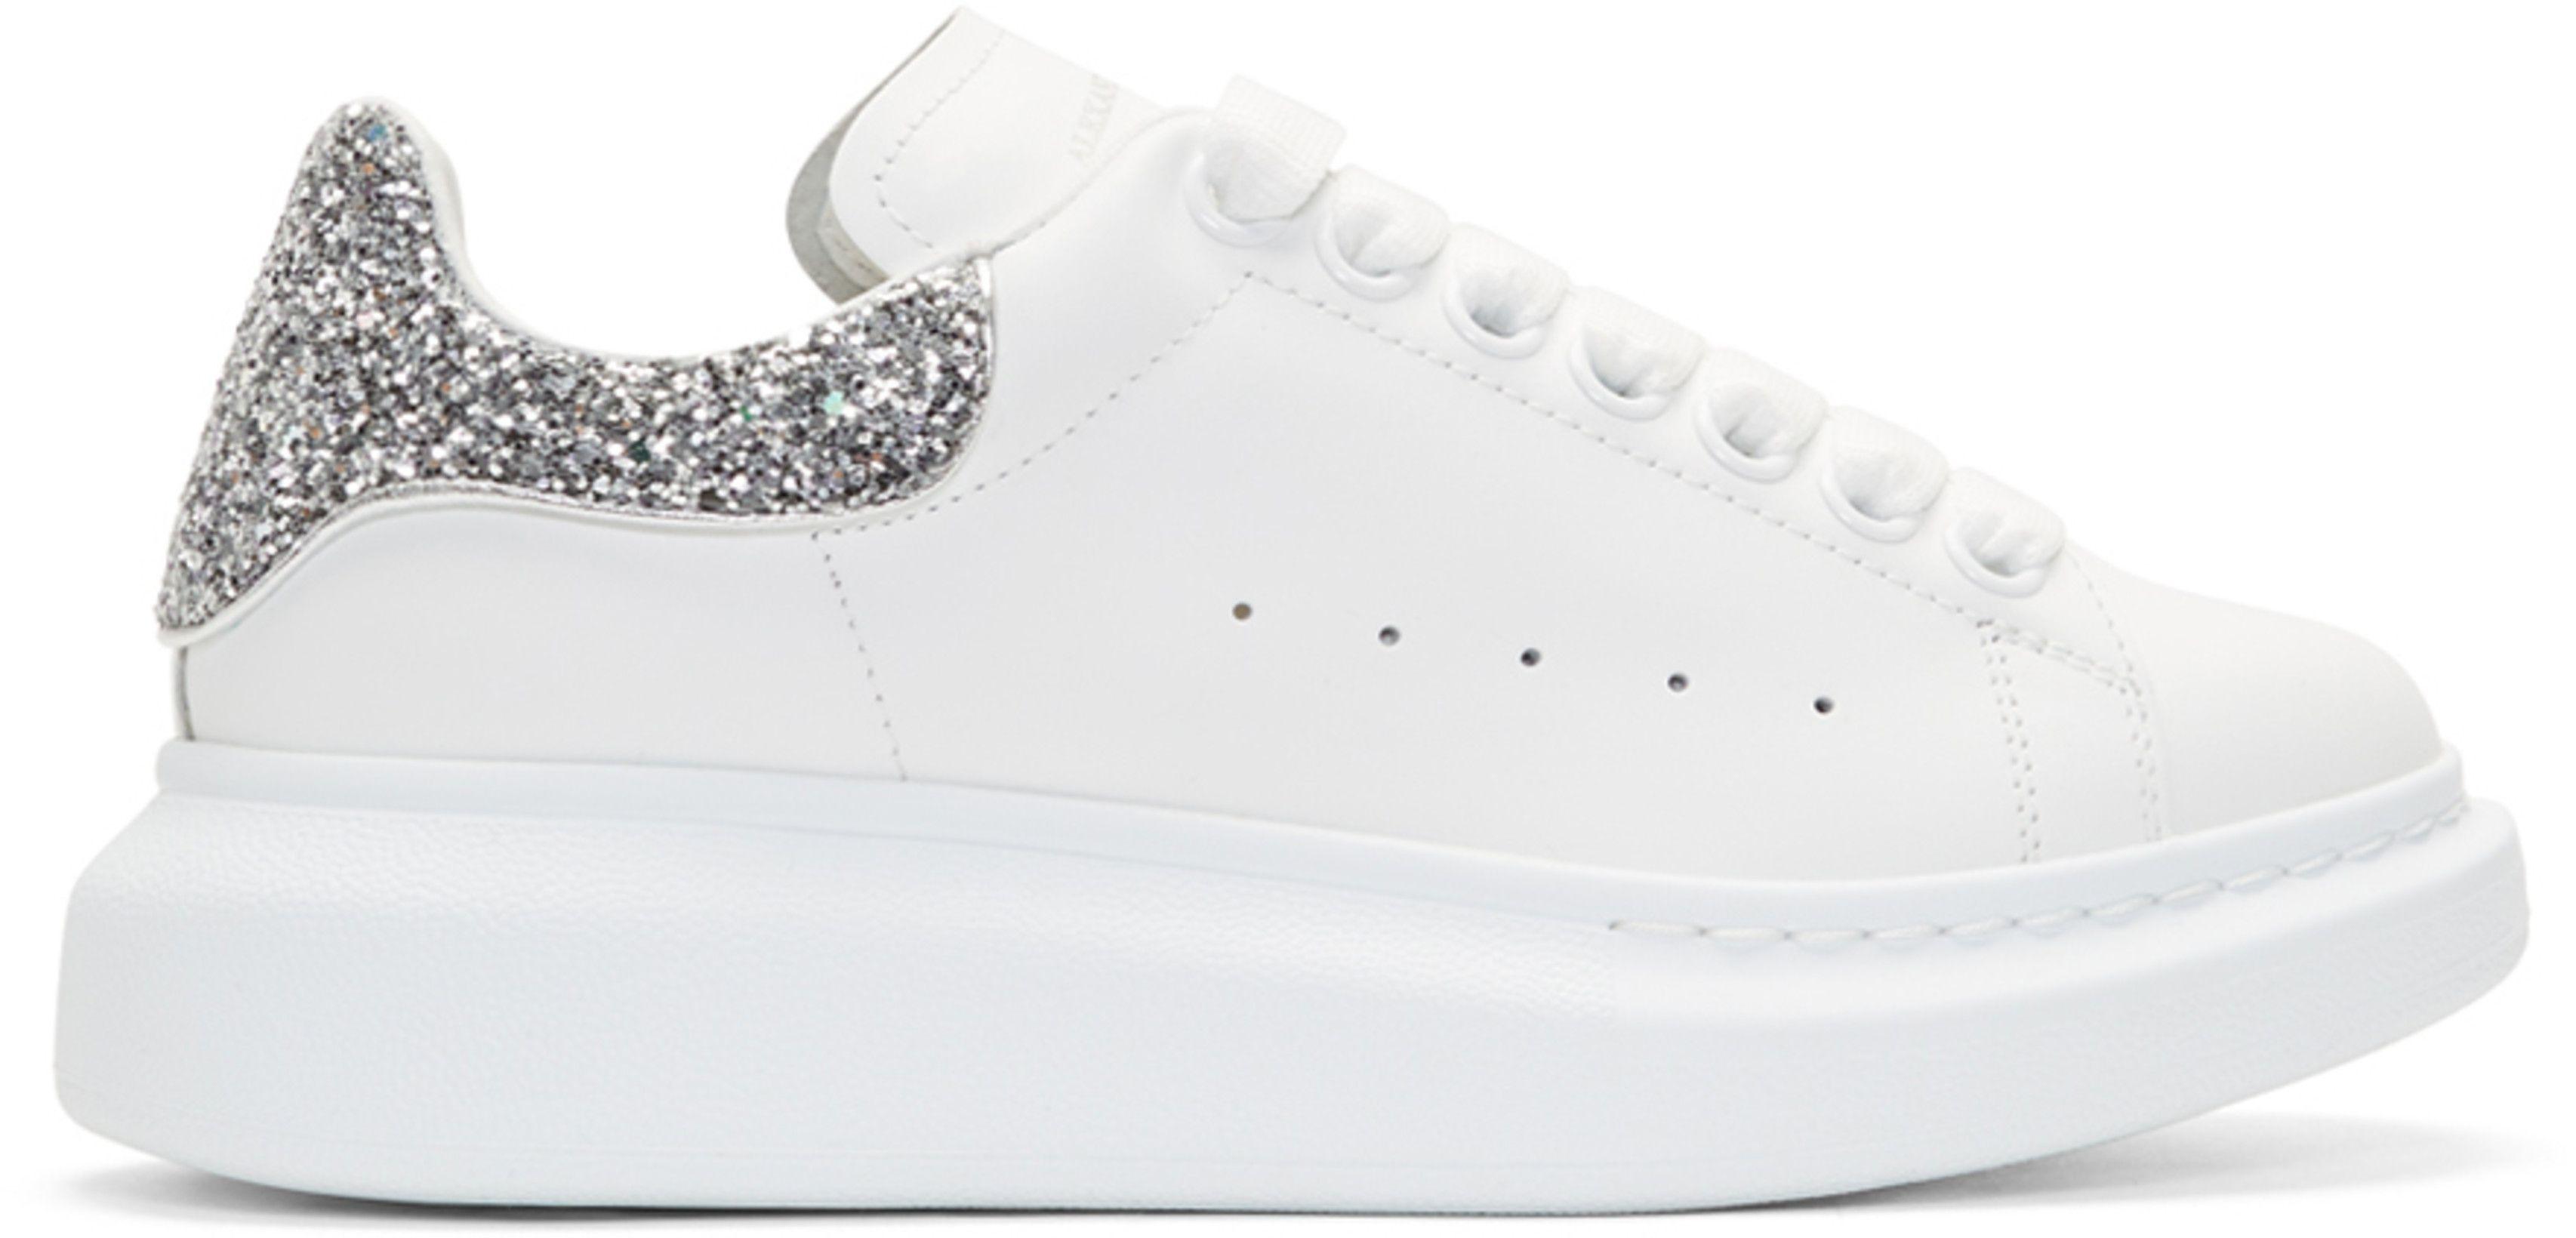 womens white glitter trainers